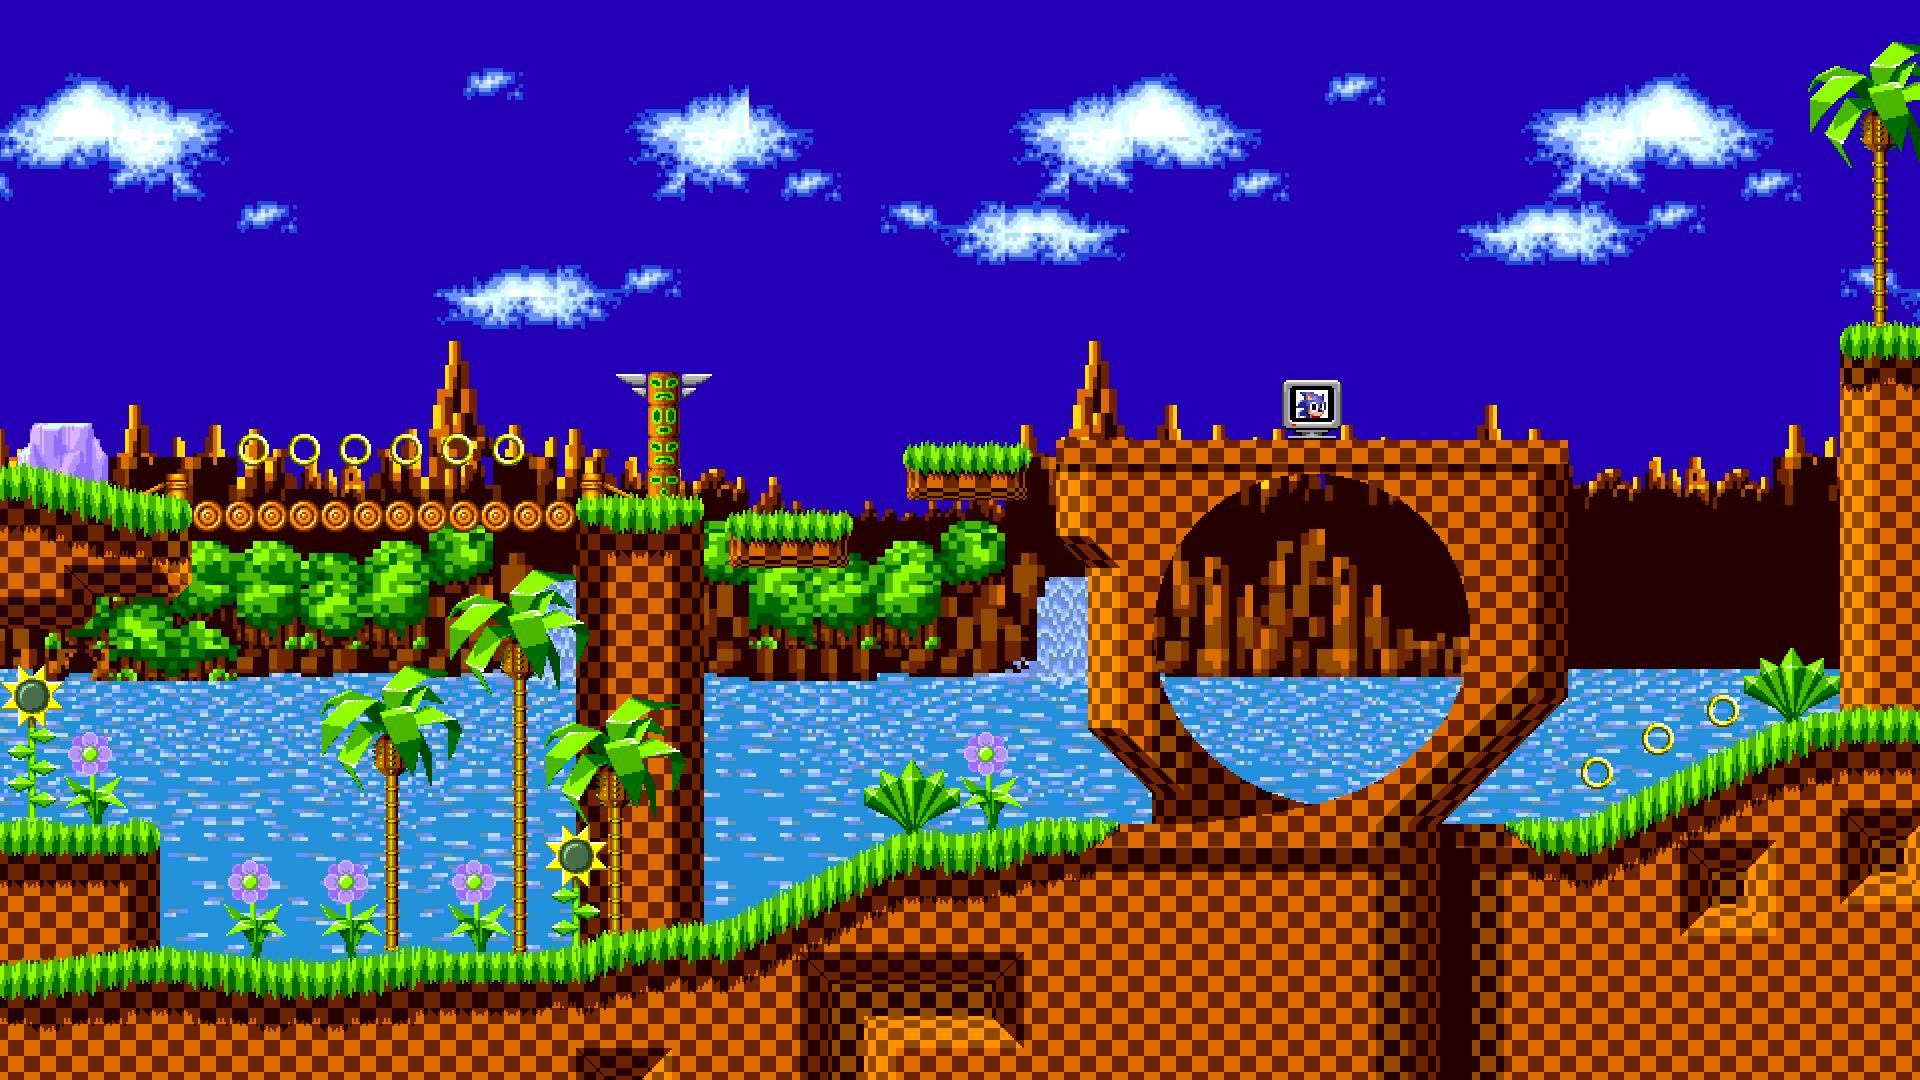 Wallpaper Sonic The Hedgehog Green Hill Zone By Jeikeytor On Deviantart